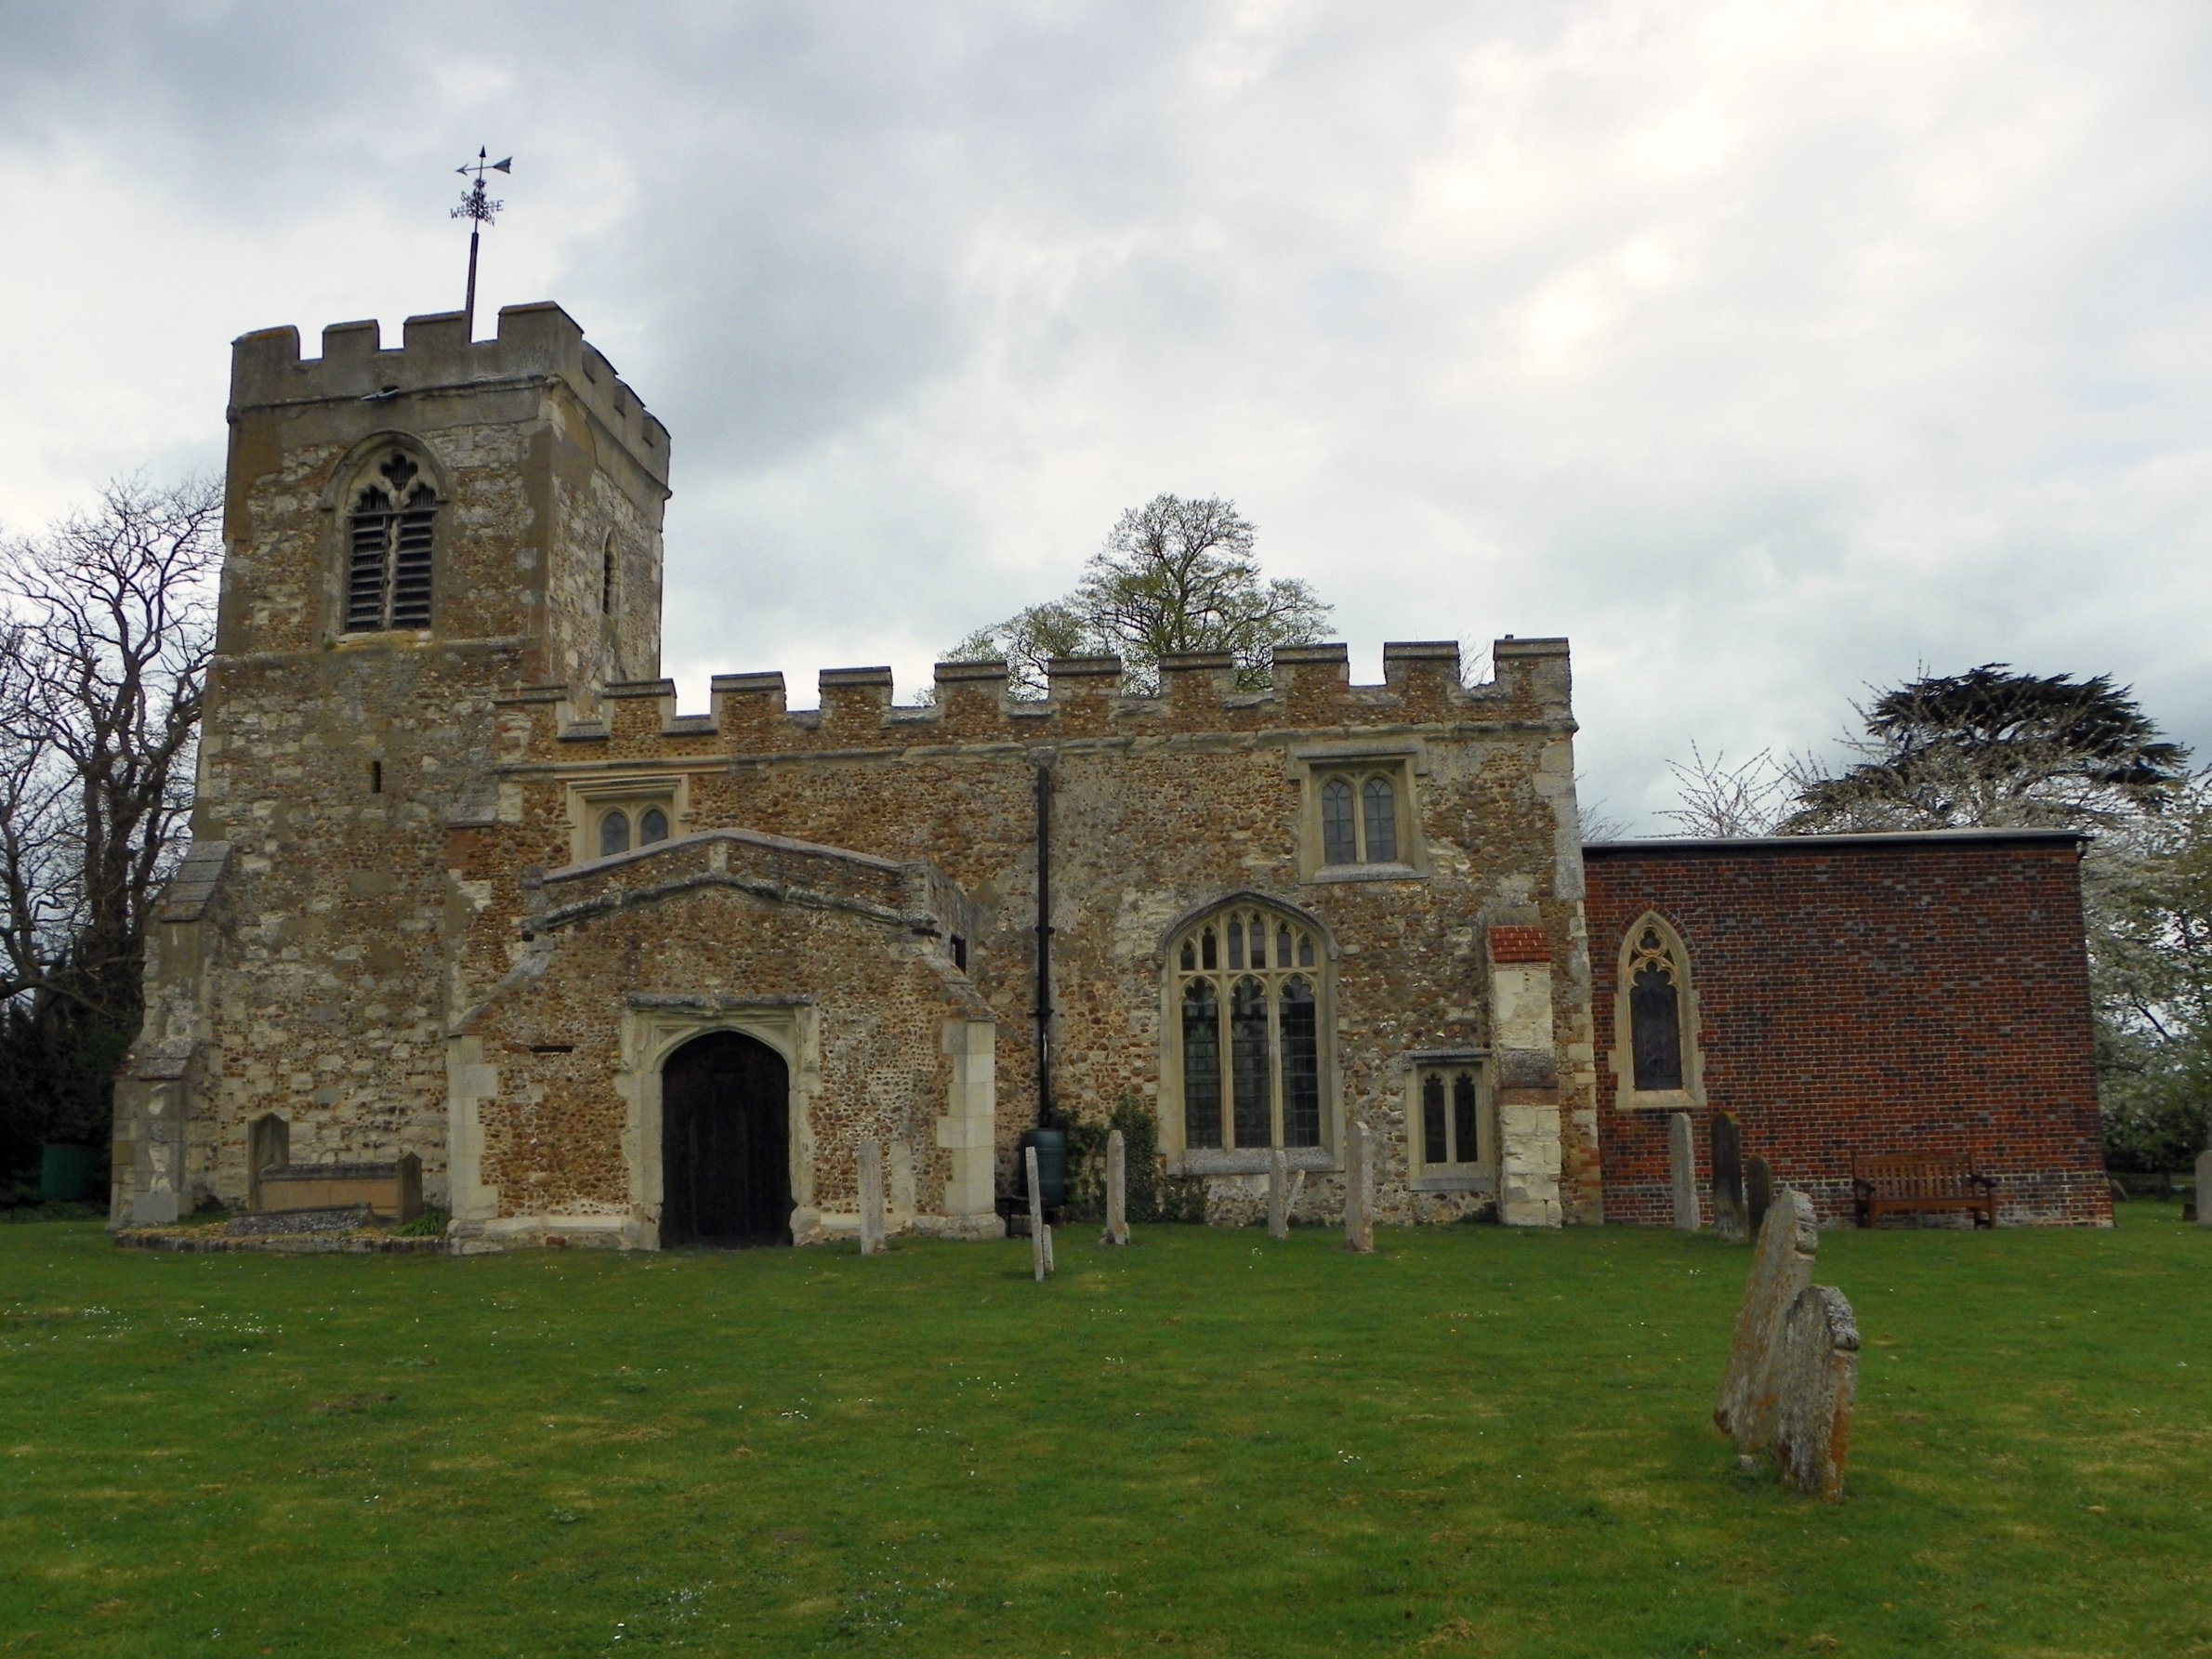 File:Church of St Nicholas, Hinxworth.jpg - Wikimedia Commons